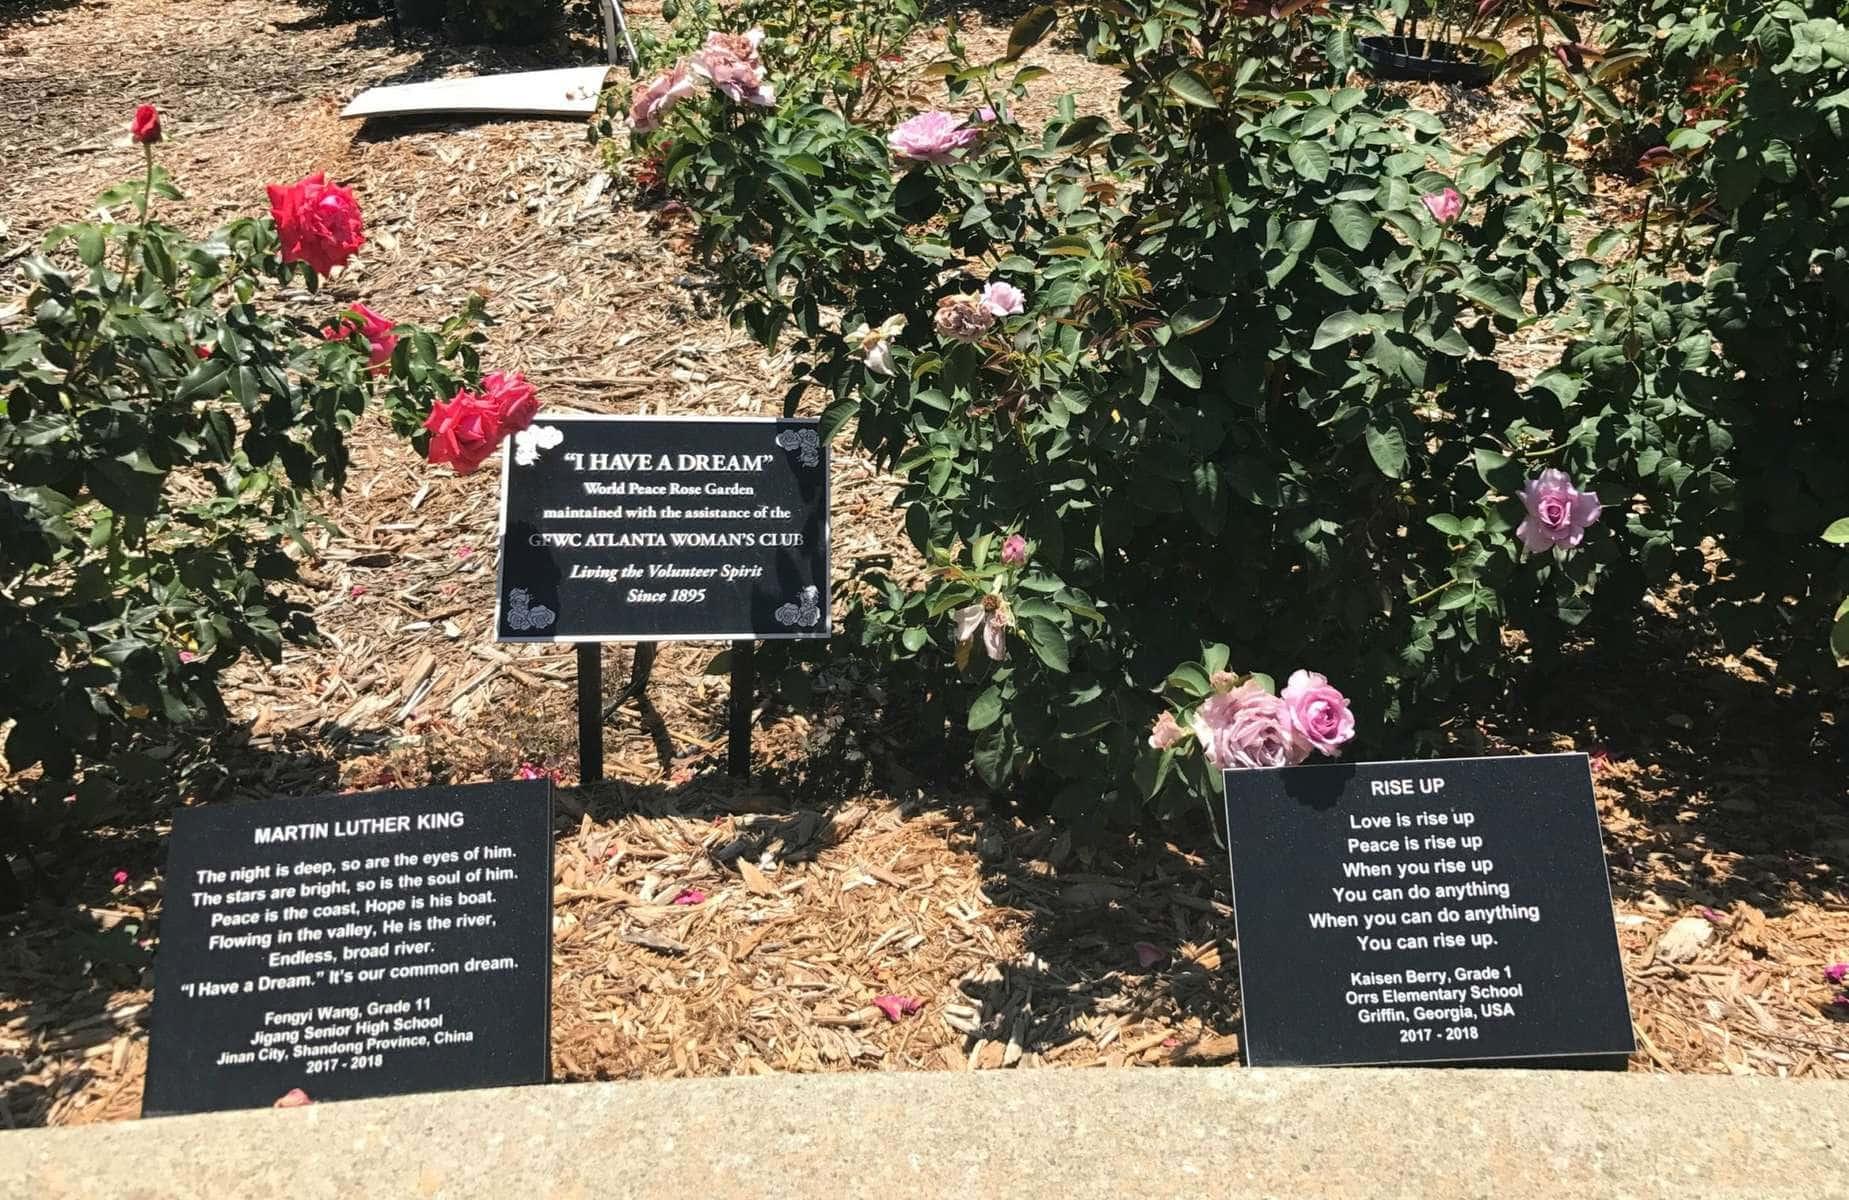 martin luther king jr rose garden